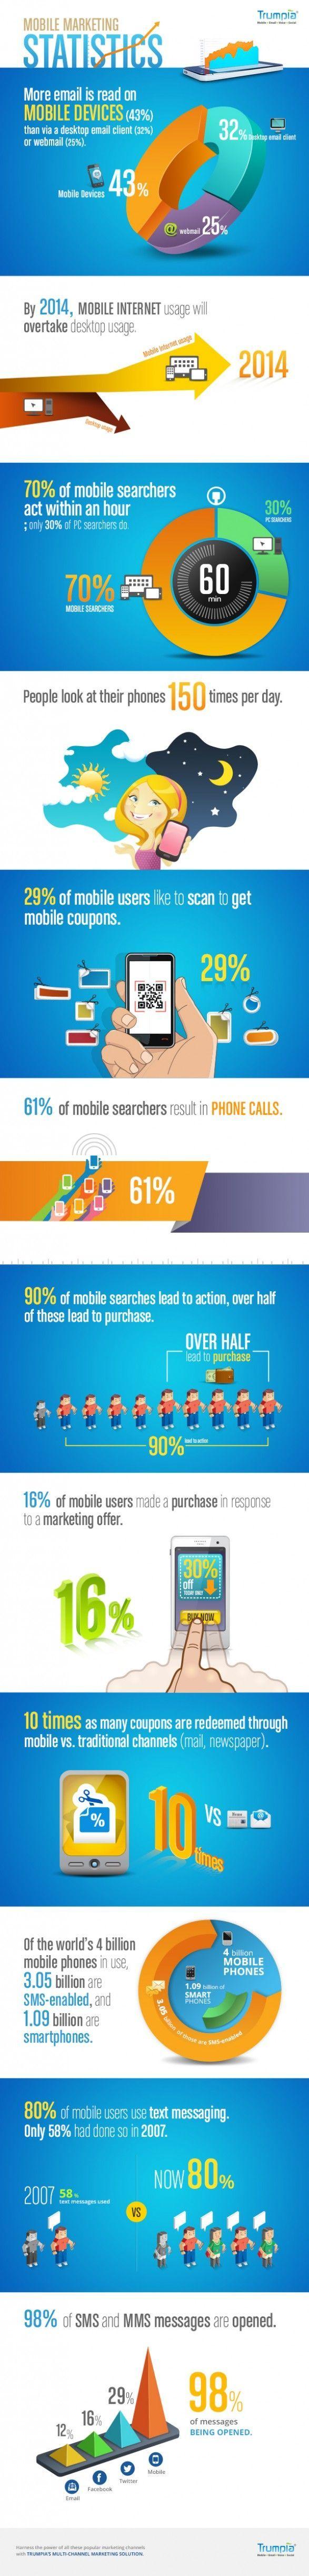 Mobil Pazarlama İstatistikleri #mobile #mobil #pazarlama #marketing #istatistik statistics #infografik #infographic